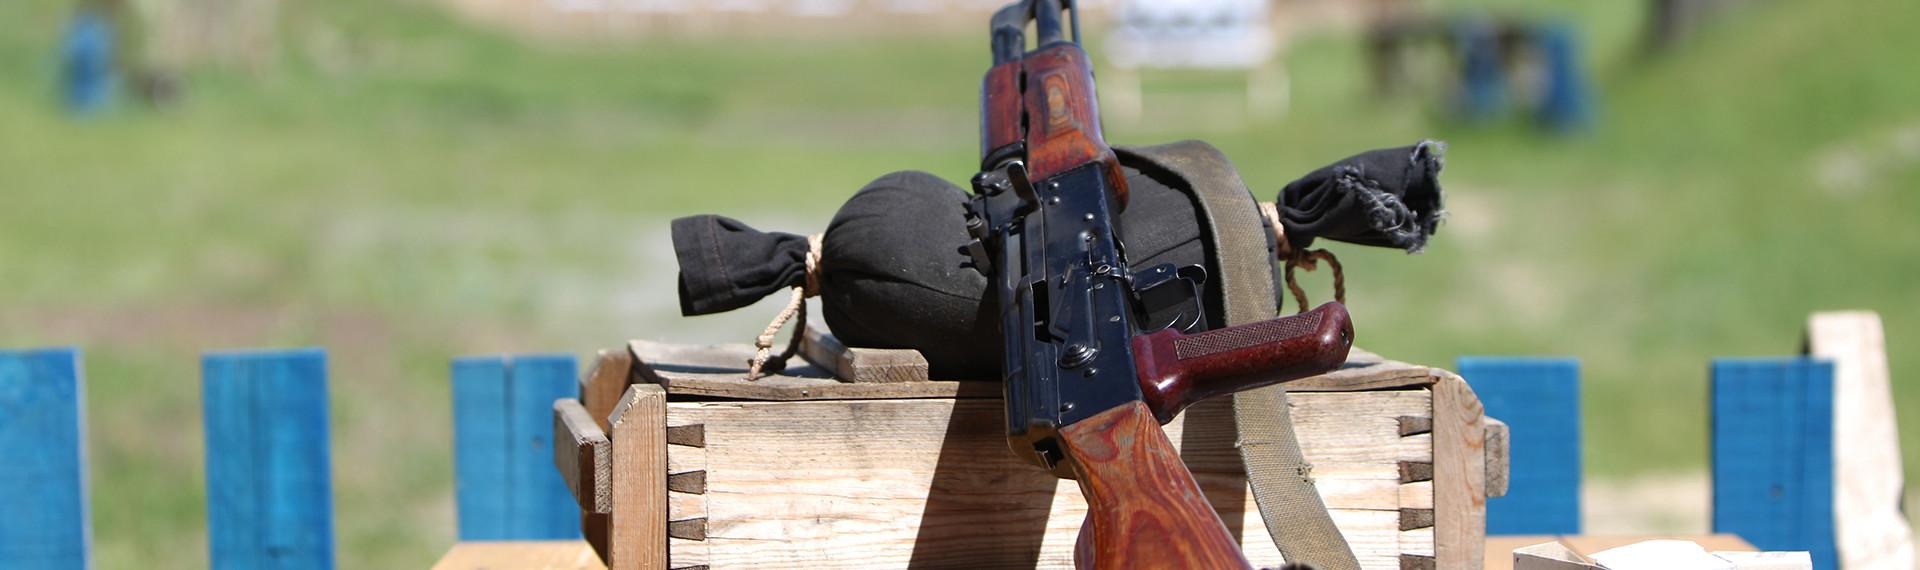 AK-47 Kalaschnikow schießen Berlin